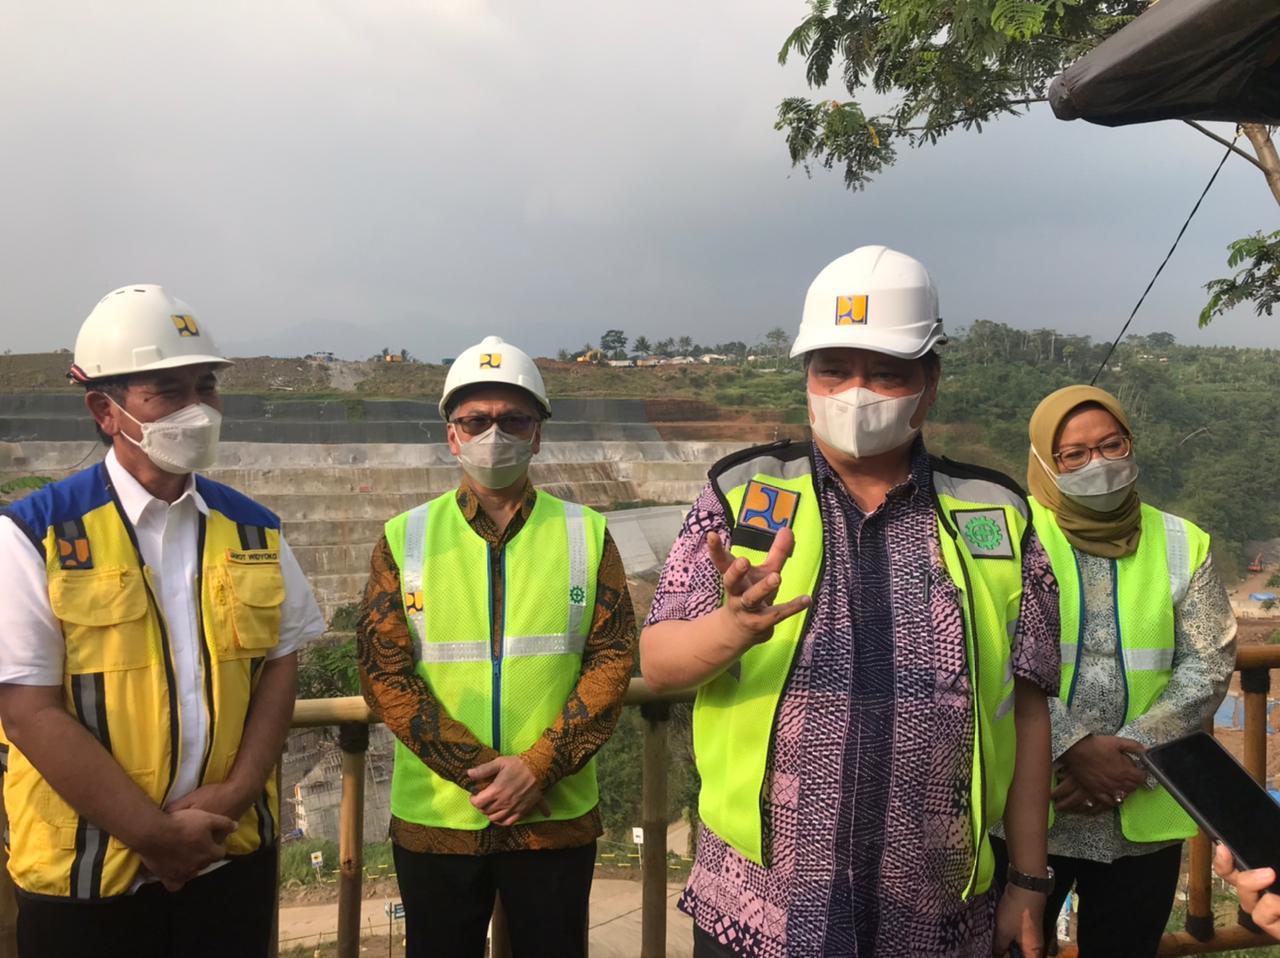 https: img.okezone.com content 2021 06 03 320 2419684 cegah-banjir-jakarta-menko-airlangga-minta-proyek-bendungan-sukamahi-dipercepat-LWKQ0t9vzQ.jpg